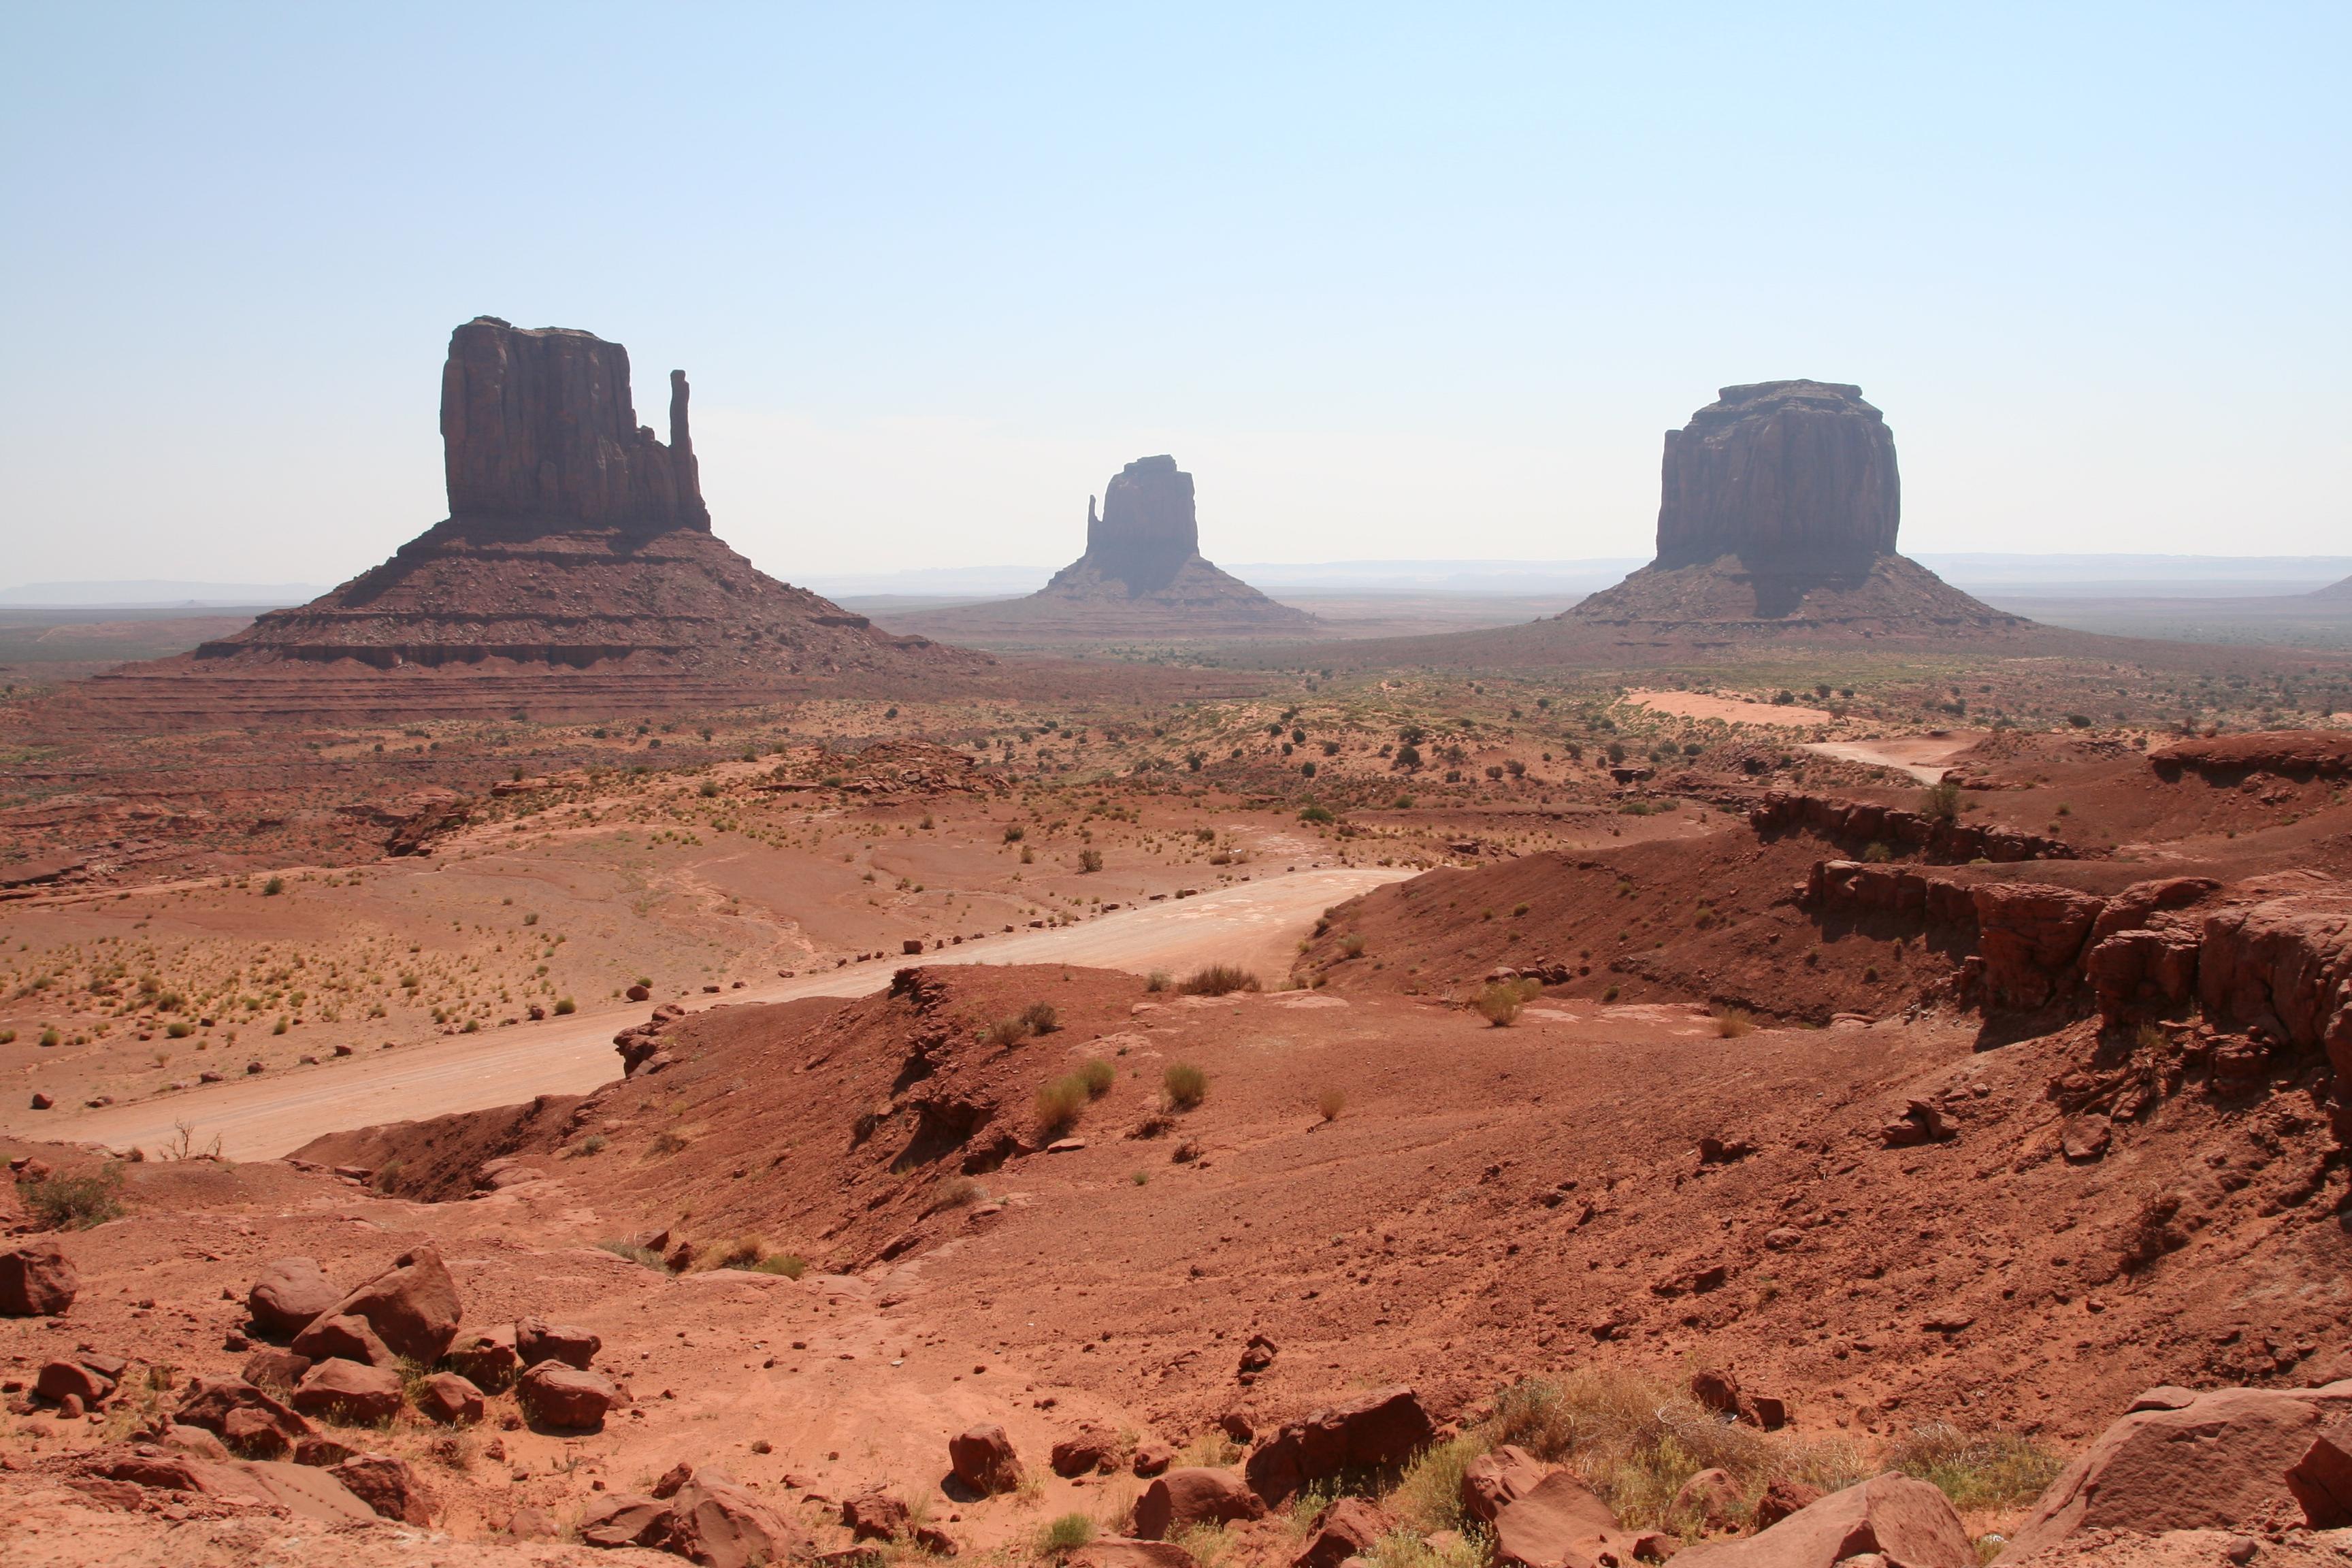 Monument Valley Navajo Tribal Park Hotel